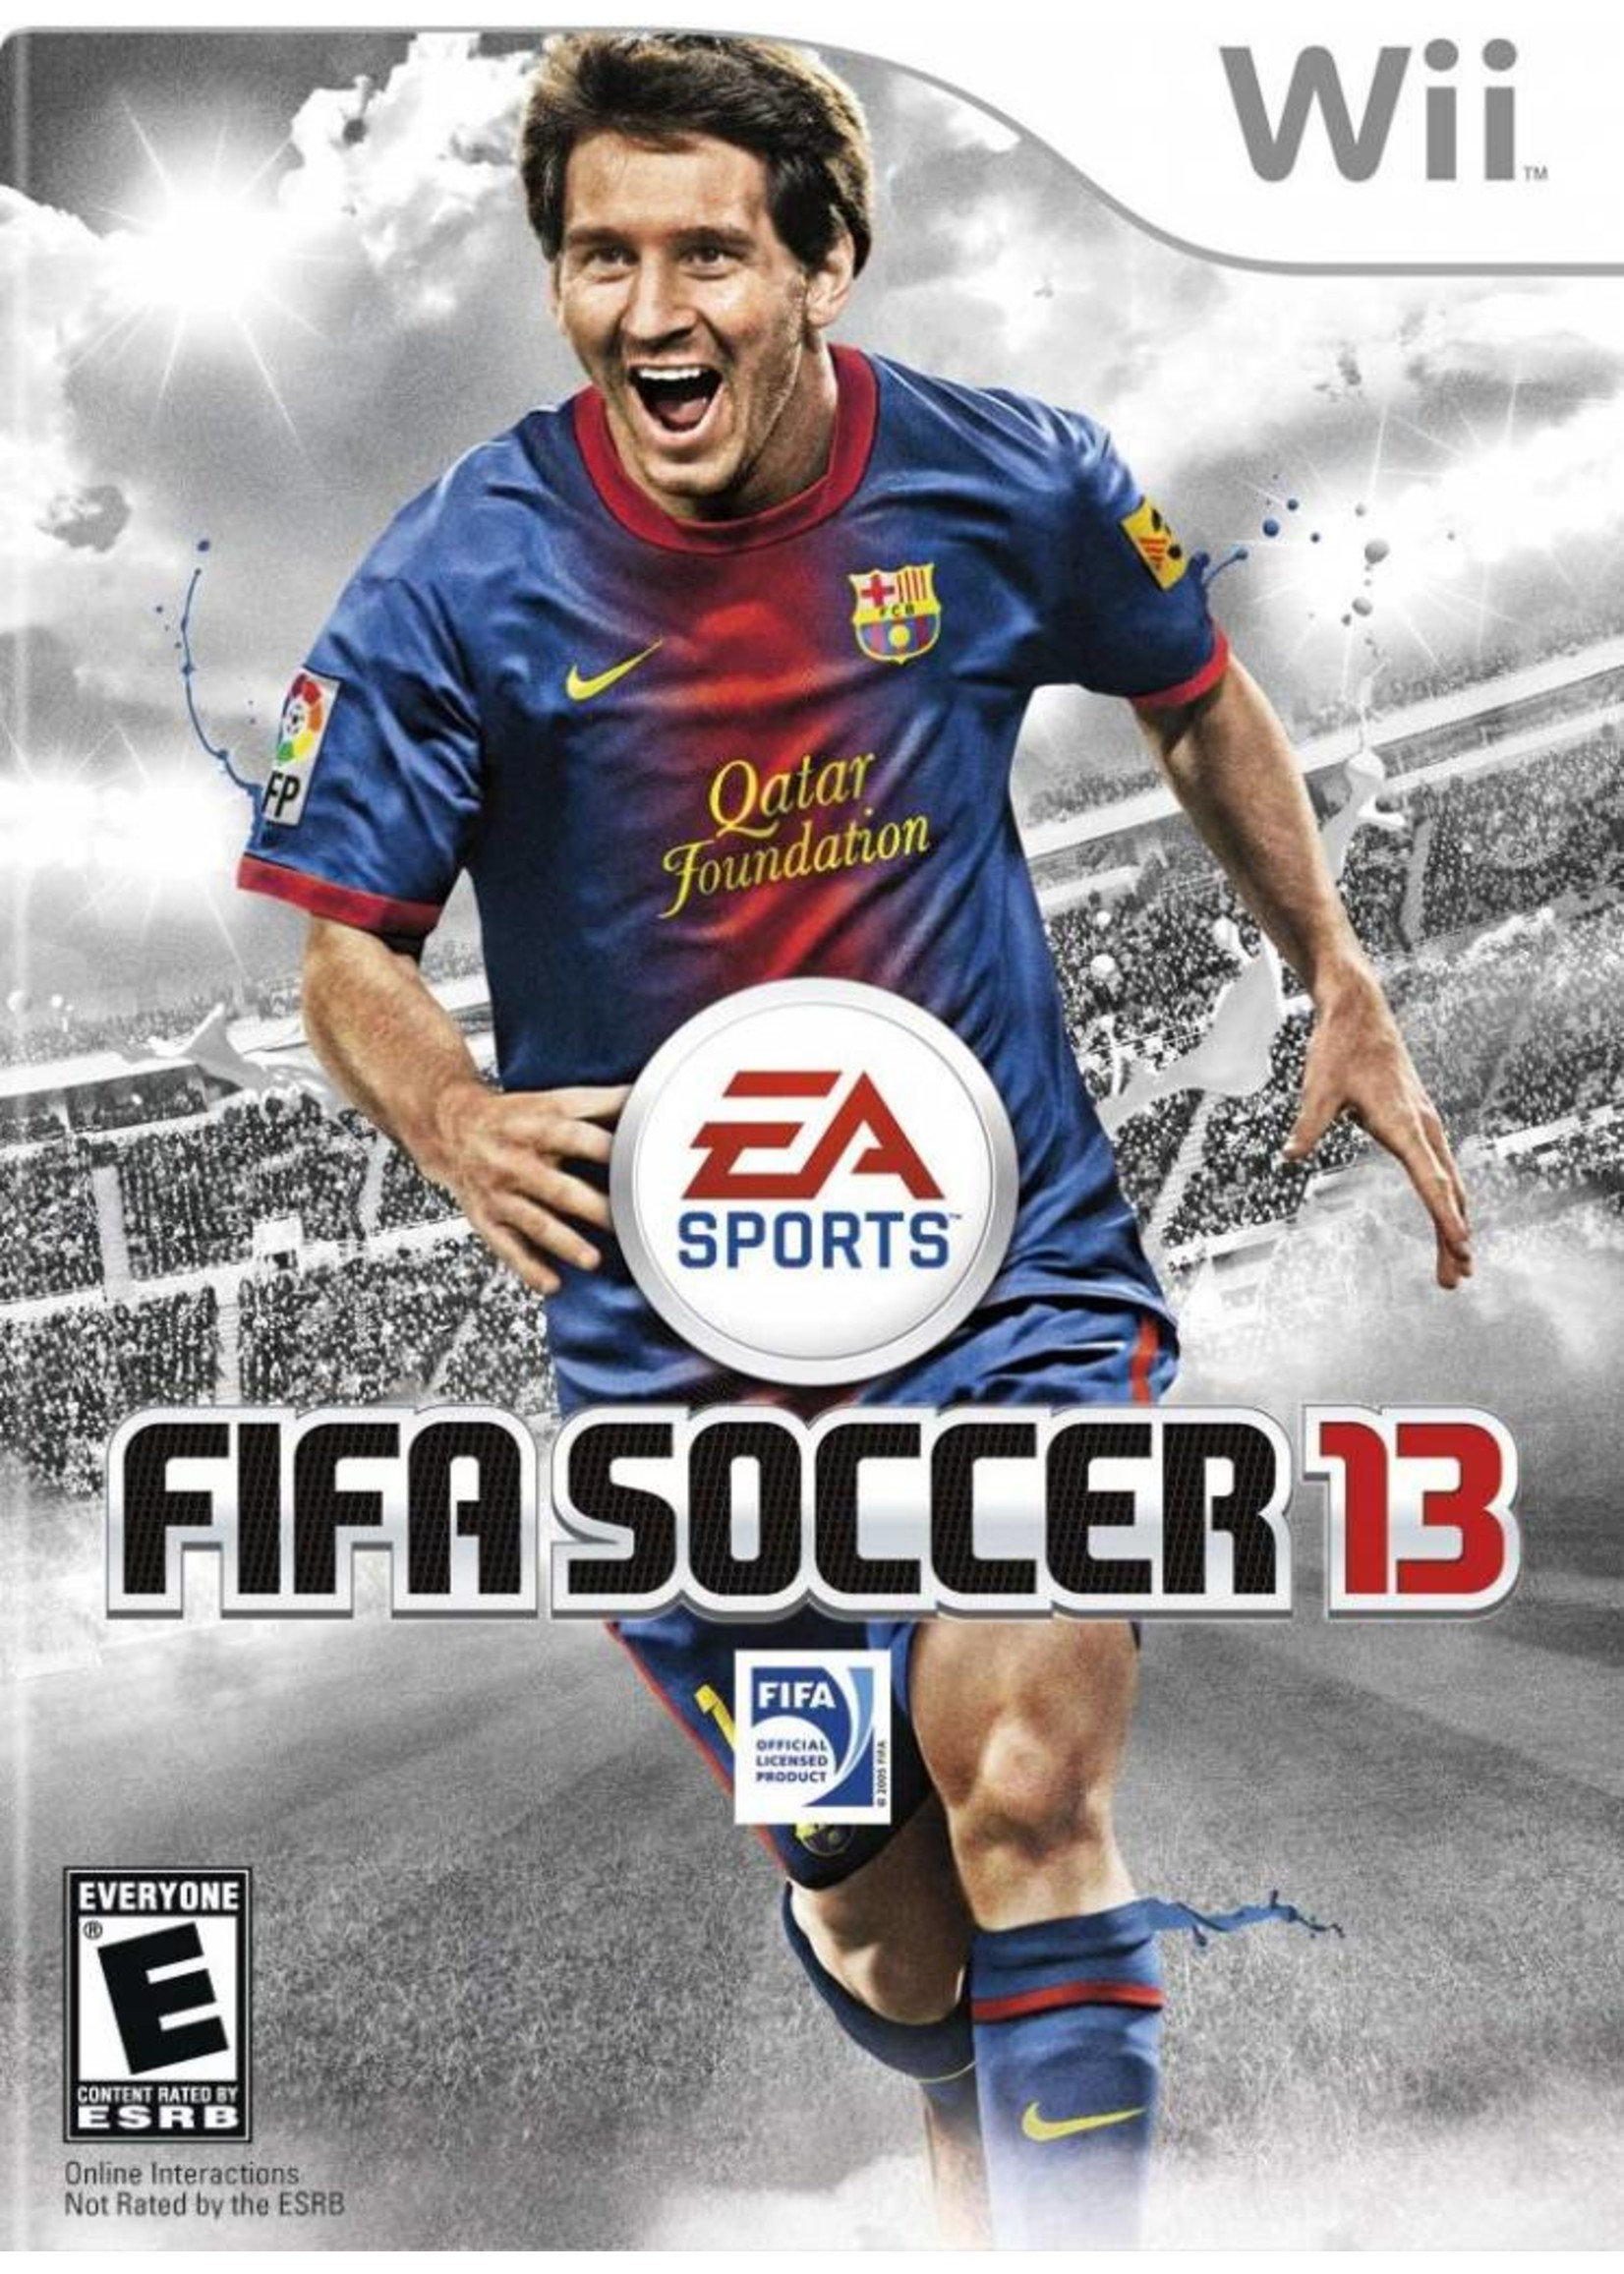 FIFA 13 - WII PrePlayed